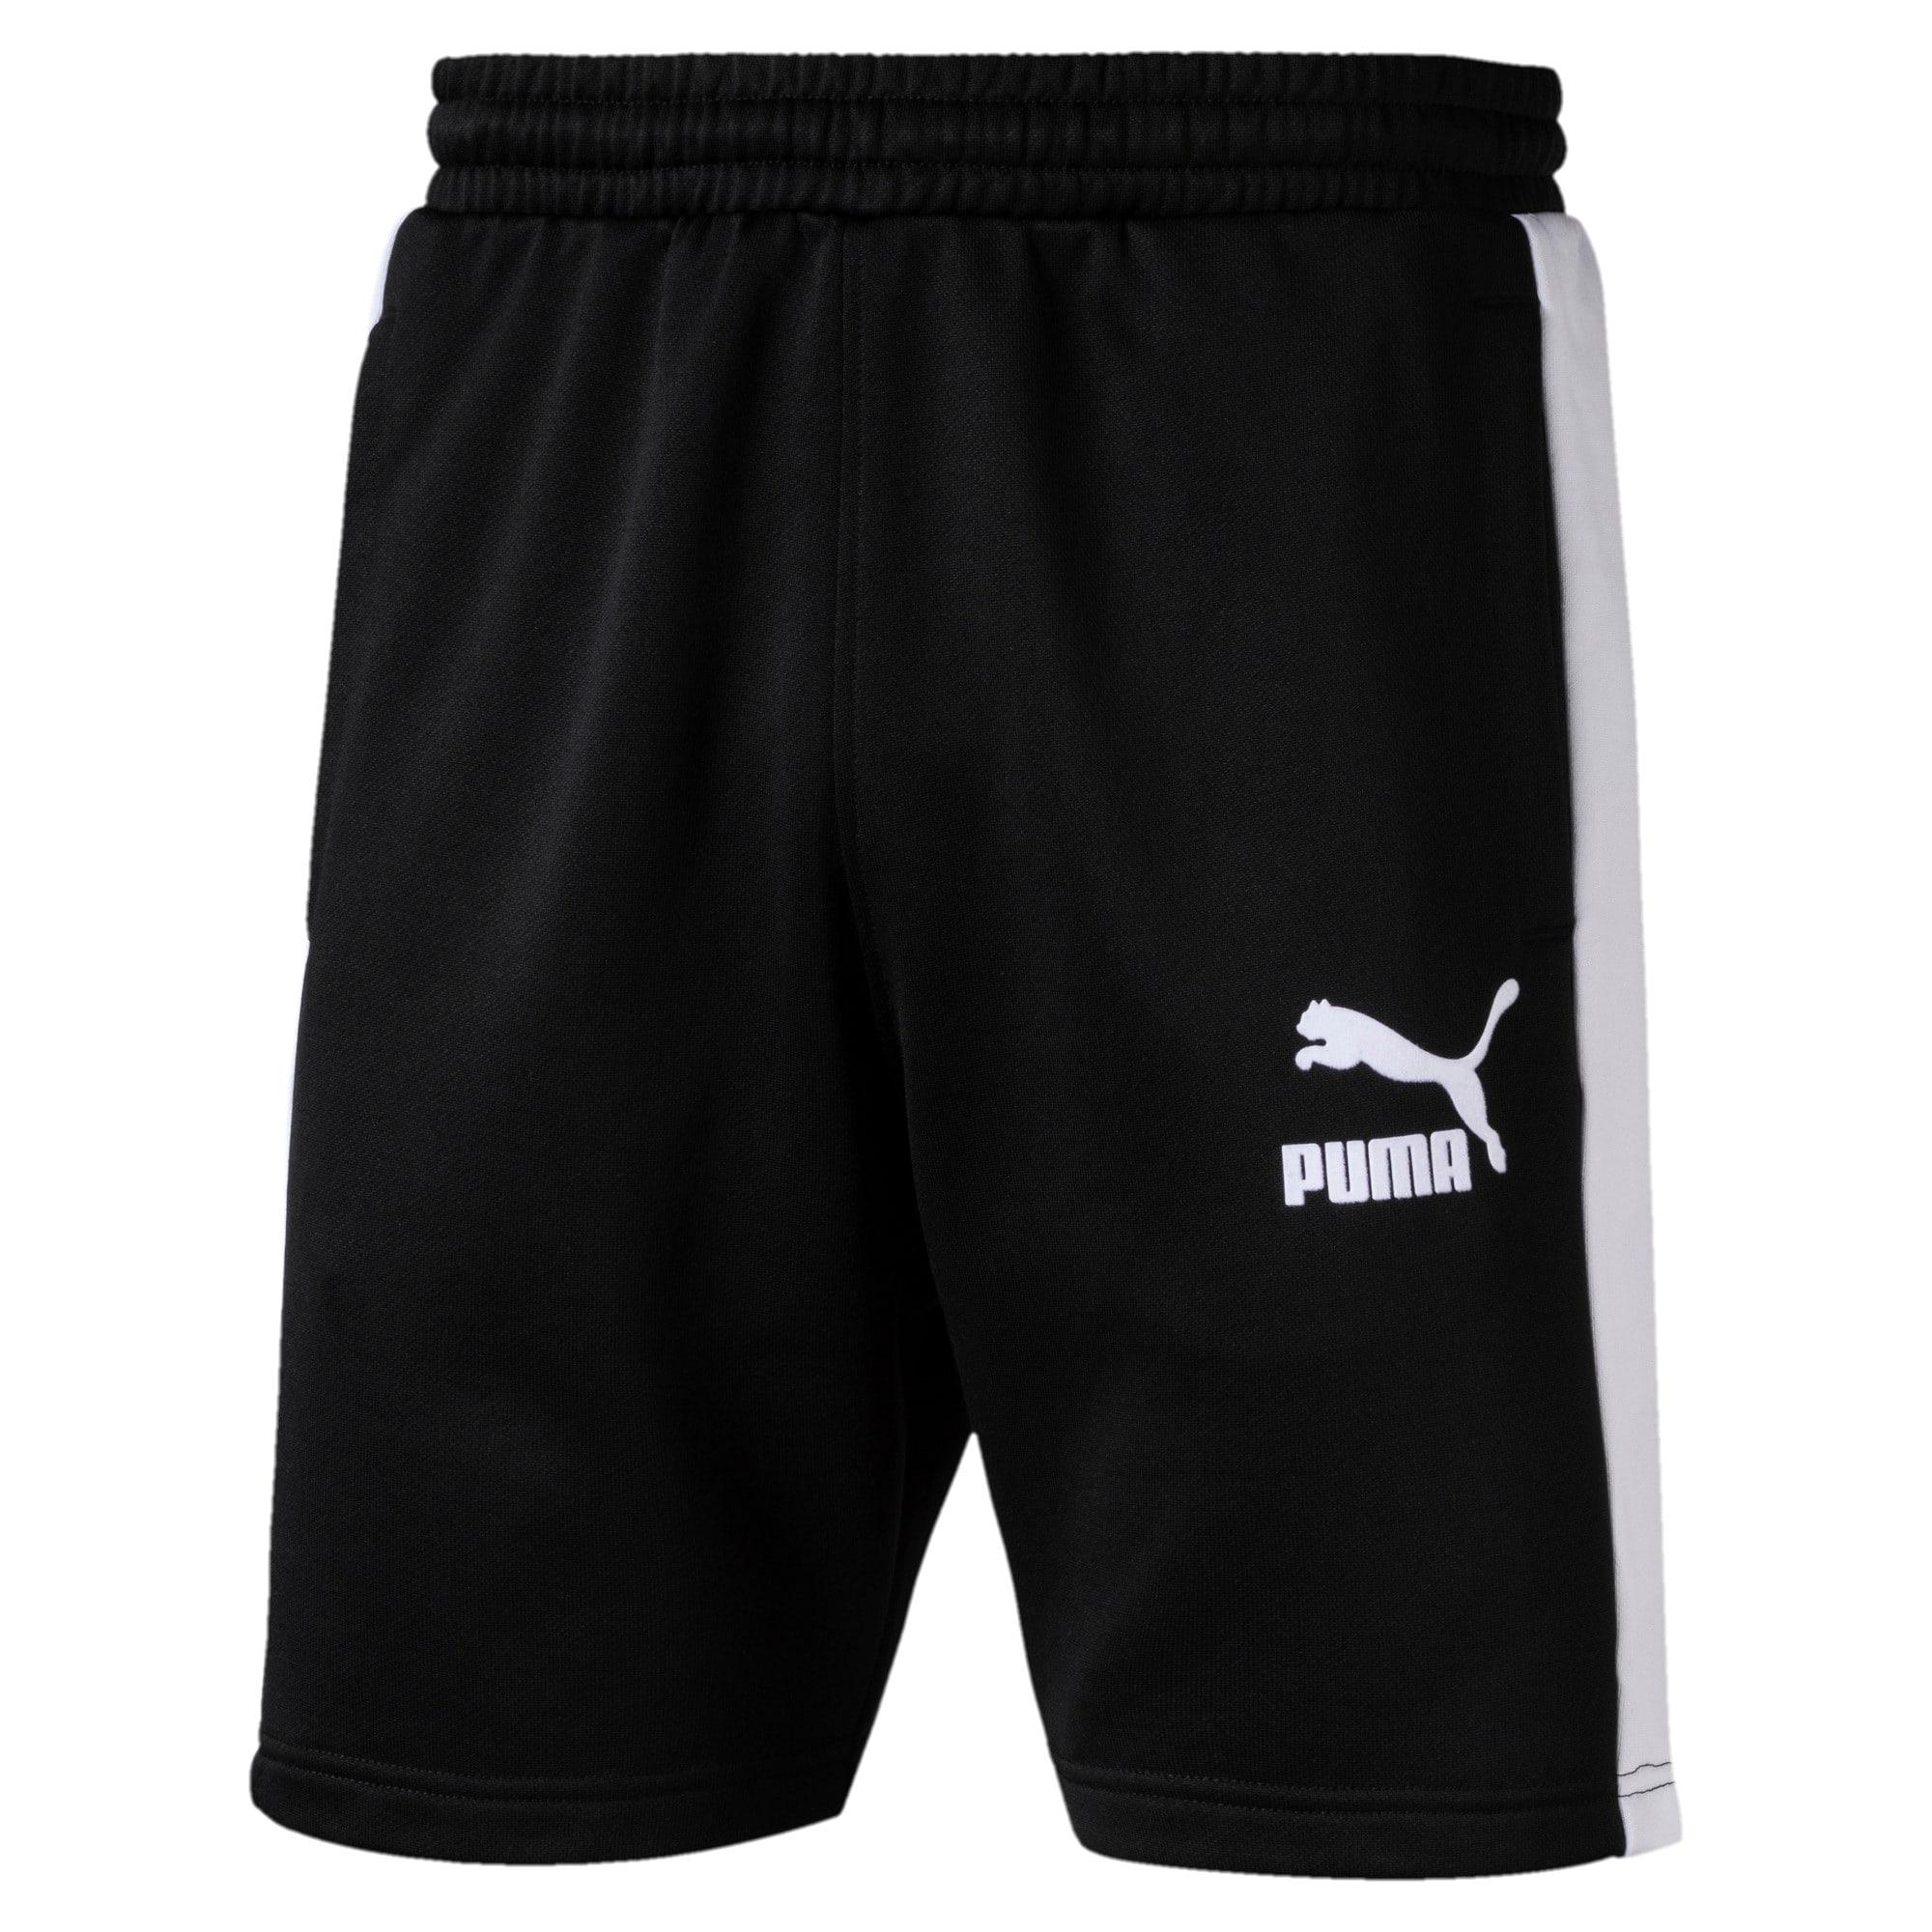 Thumbnail 1 of ArchiveT7 Men's Shorts, Puma Black, medium-IND